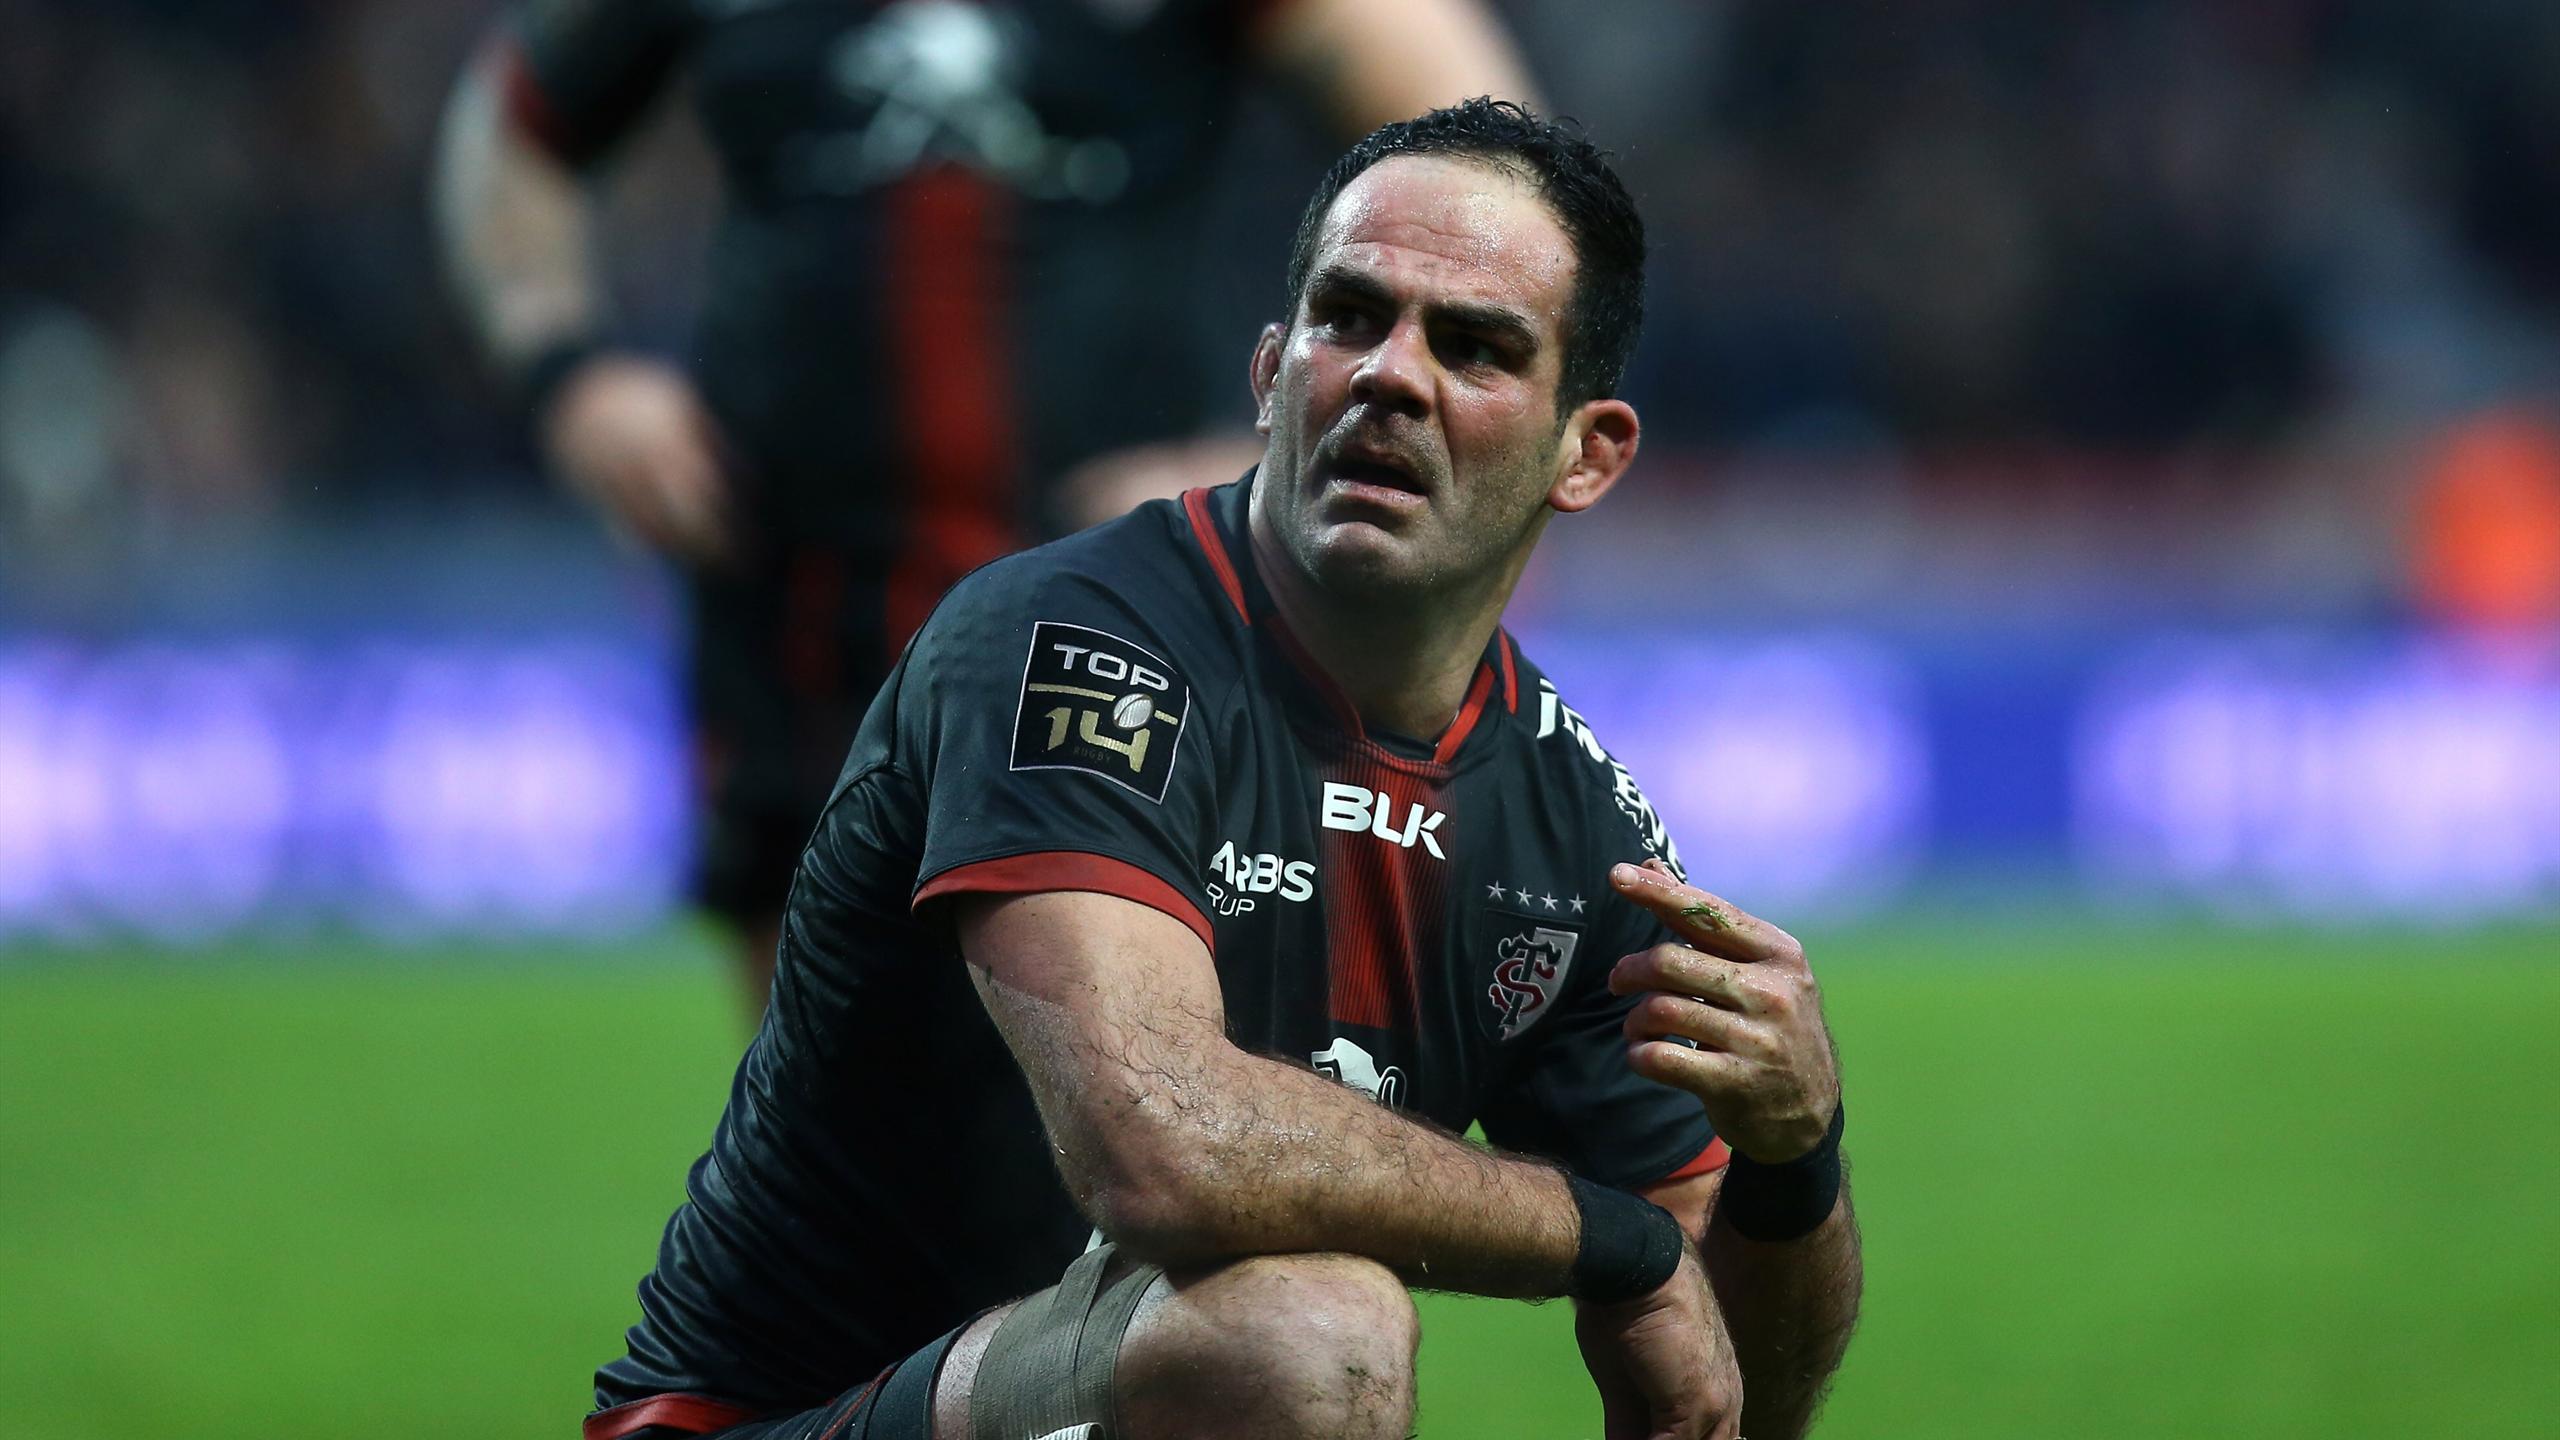 Grégory Lamboley va quitter Toulouse